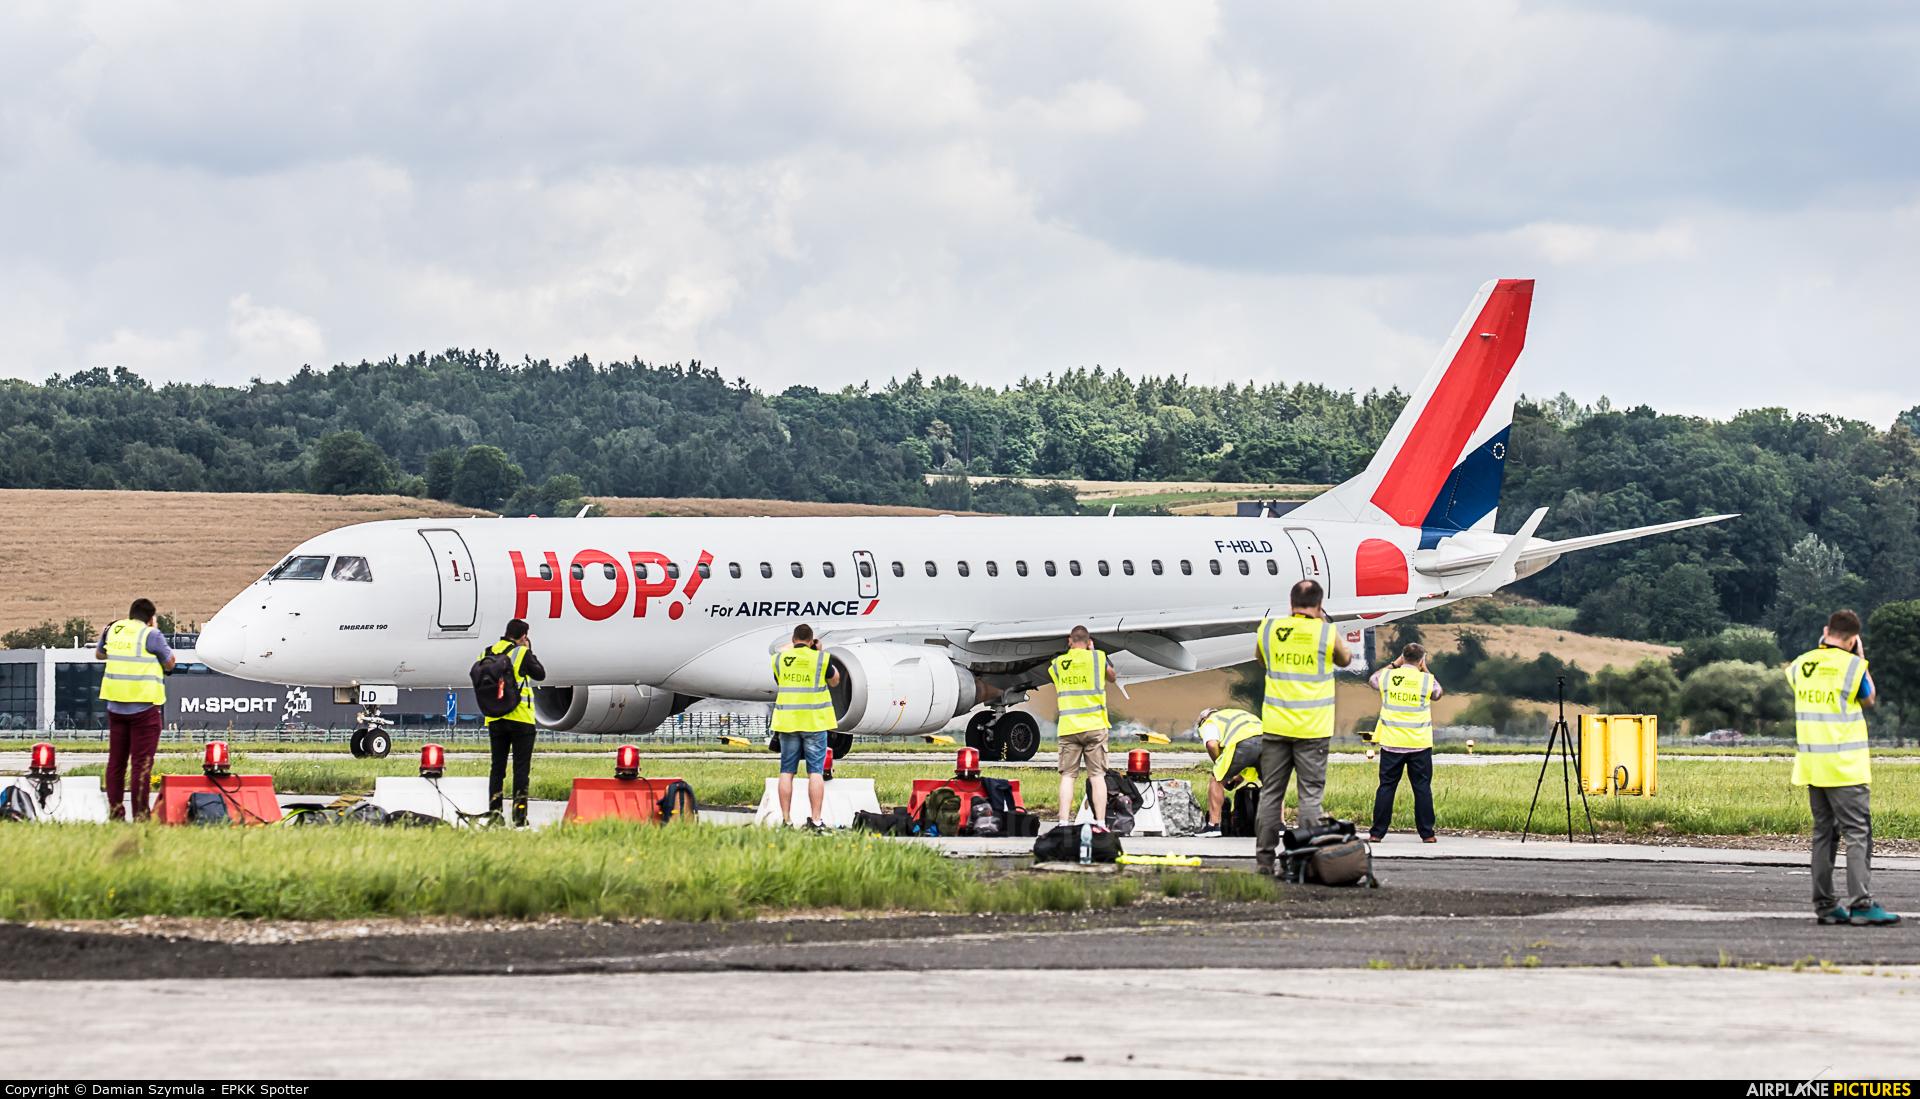 Air France - Hop! F-HBLD aircraft at Kraków - John Paul II Intl